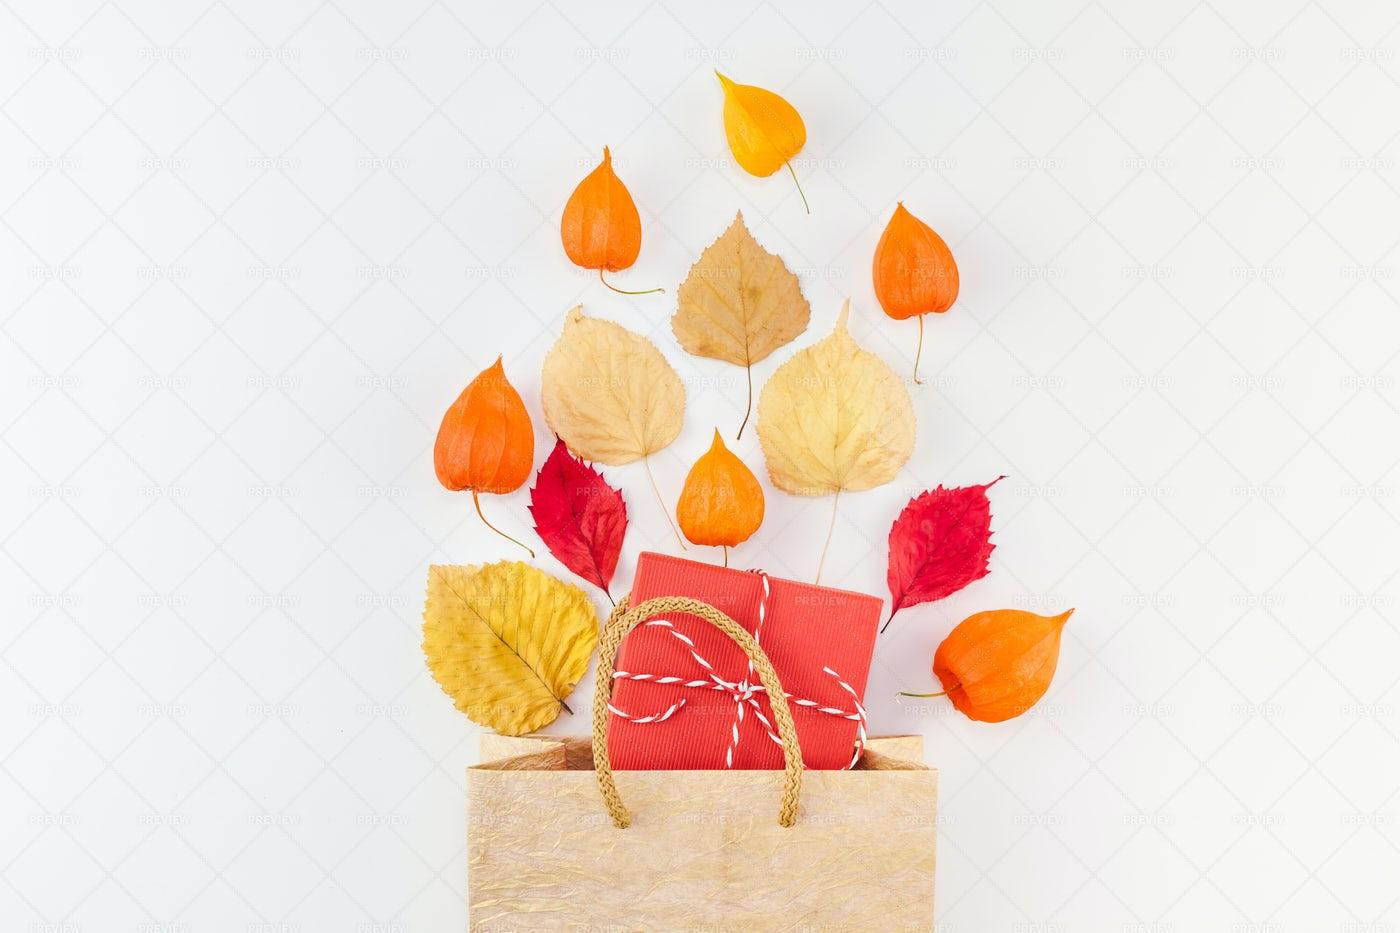 Autumn Gift Bag: Stock Photos